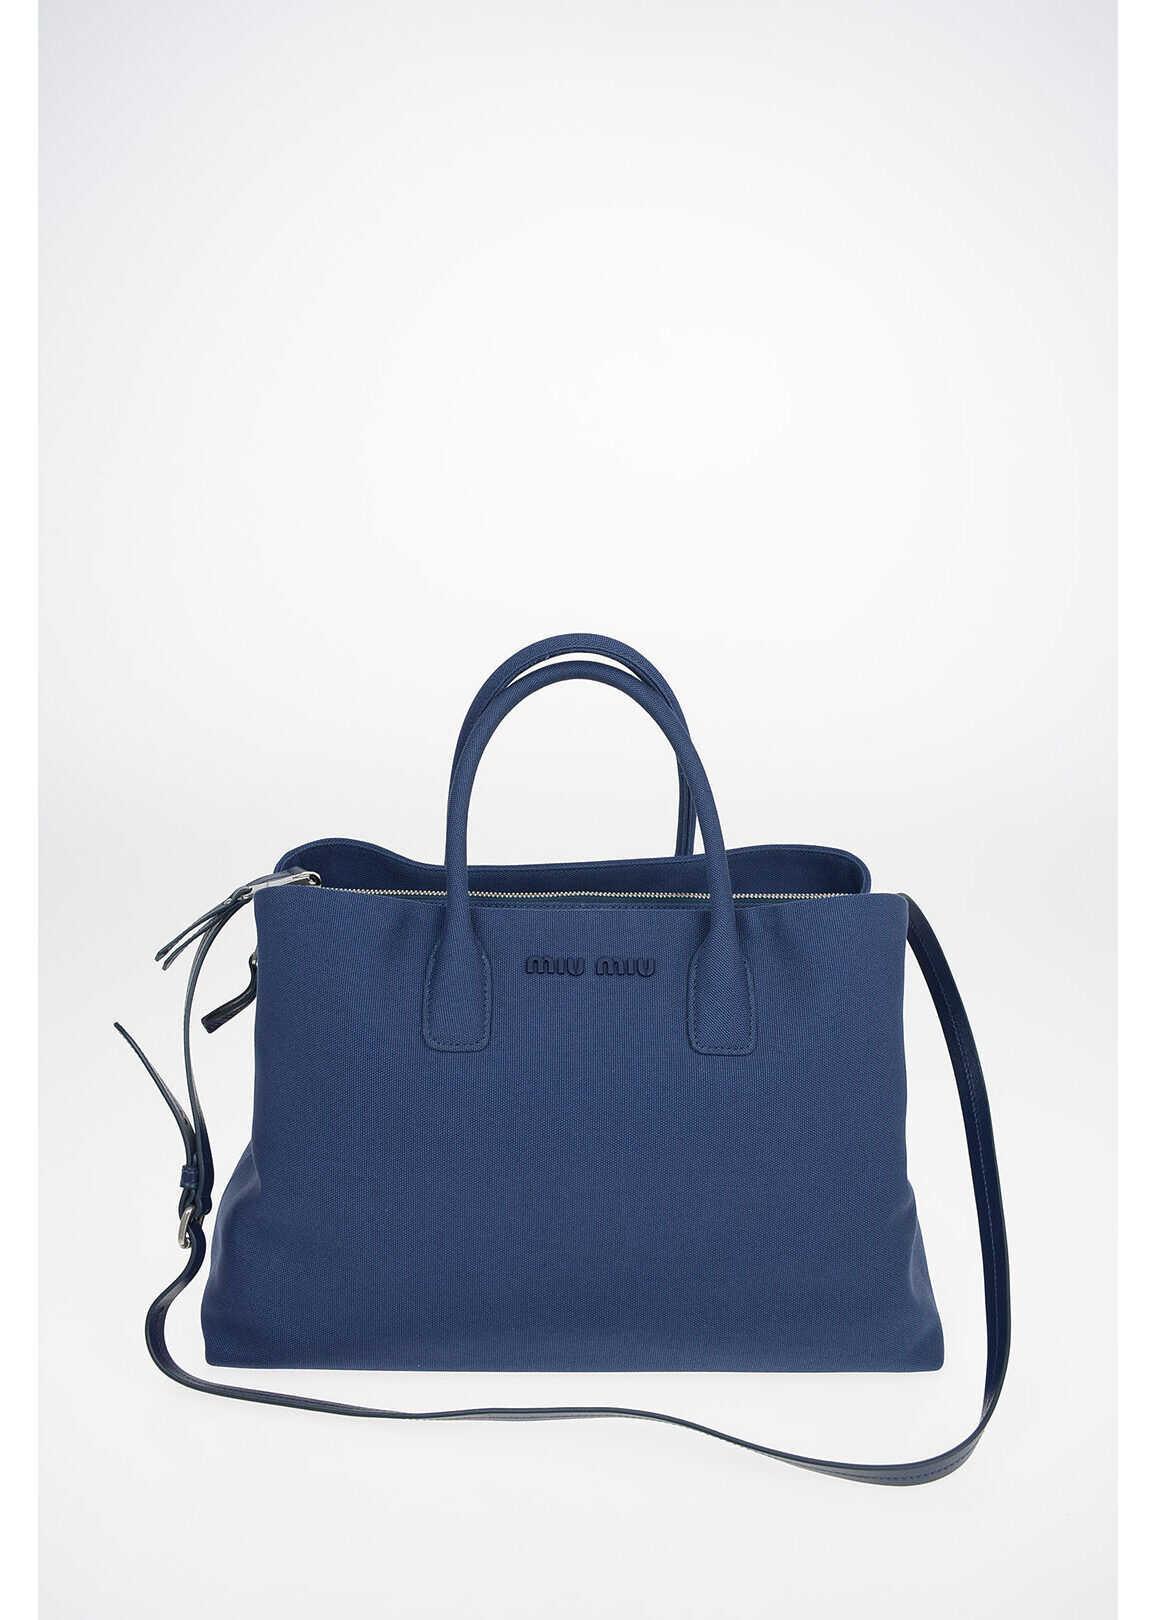 Miu Miu Canvas Tote Bag With Removable Shoulder Strap BLUE imagine b-mall.ro